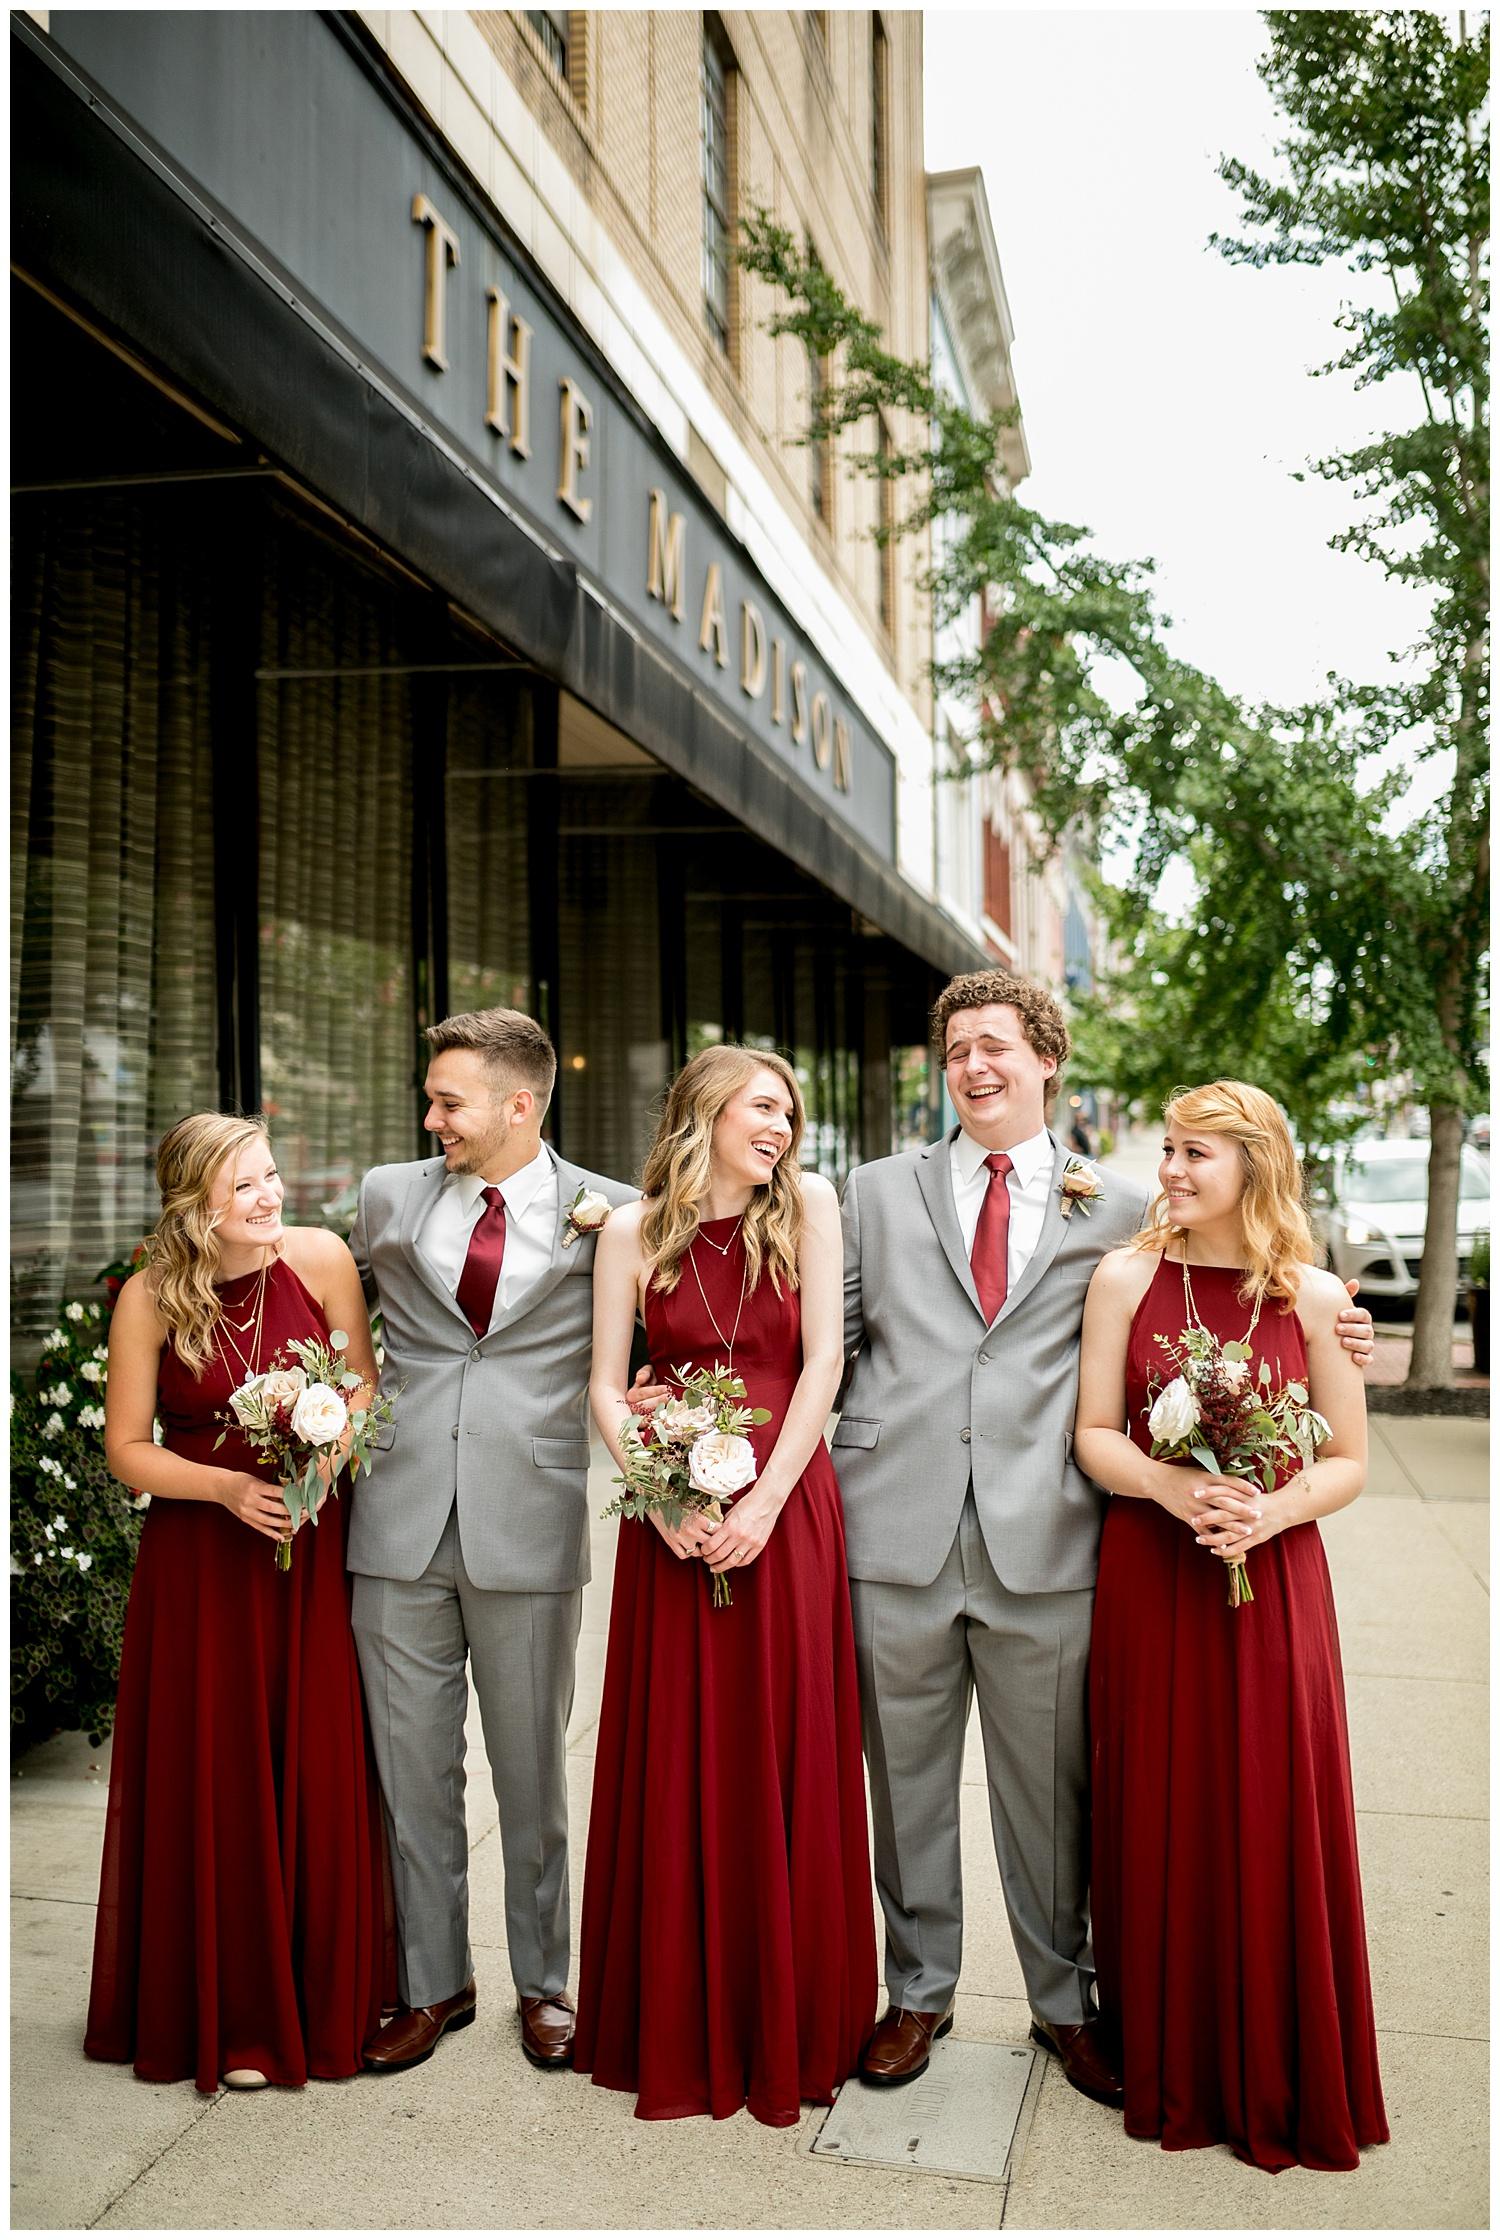 TheSmythCollective-Best-Cincinnati-Wedding-Photographer-Urban-Downtown-Covington-Wedding-10.jpg